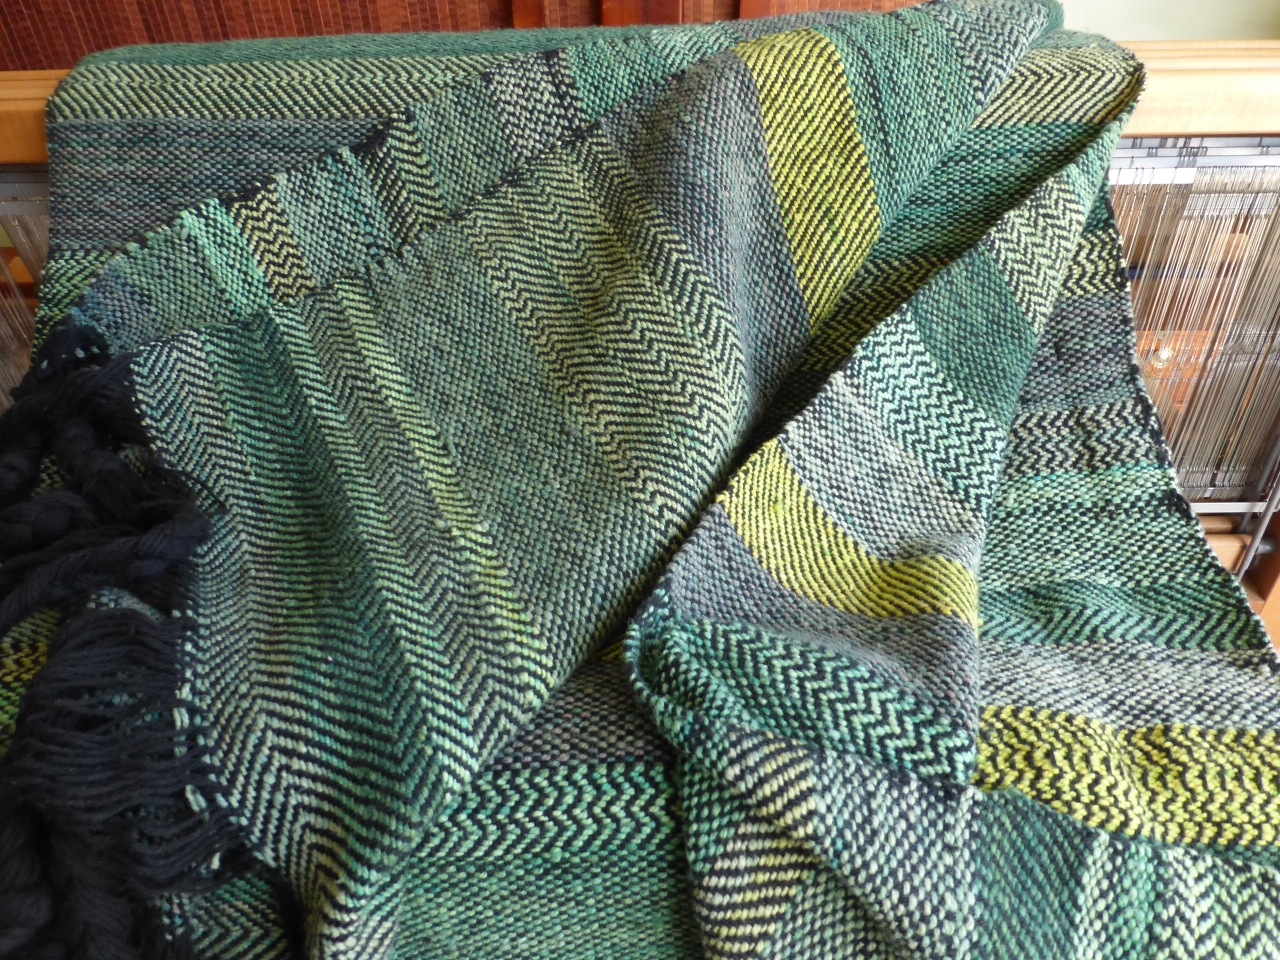 Finished Fabric